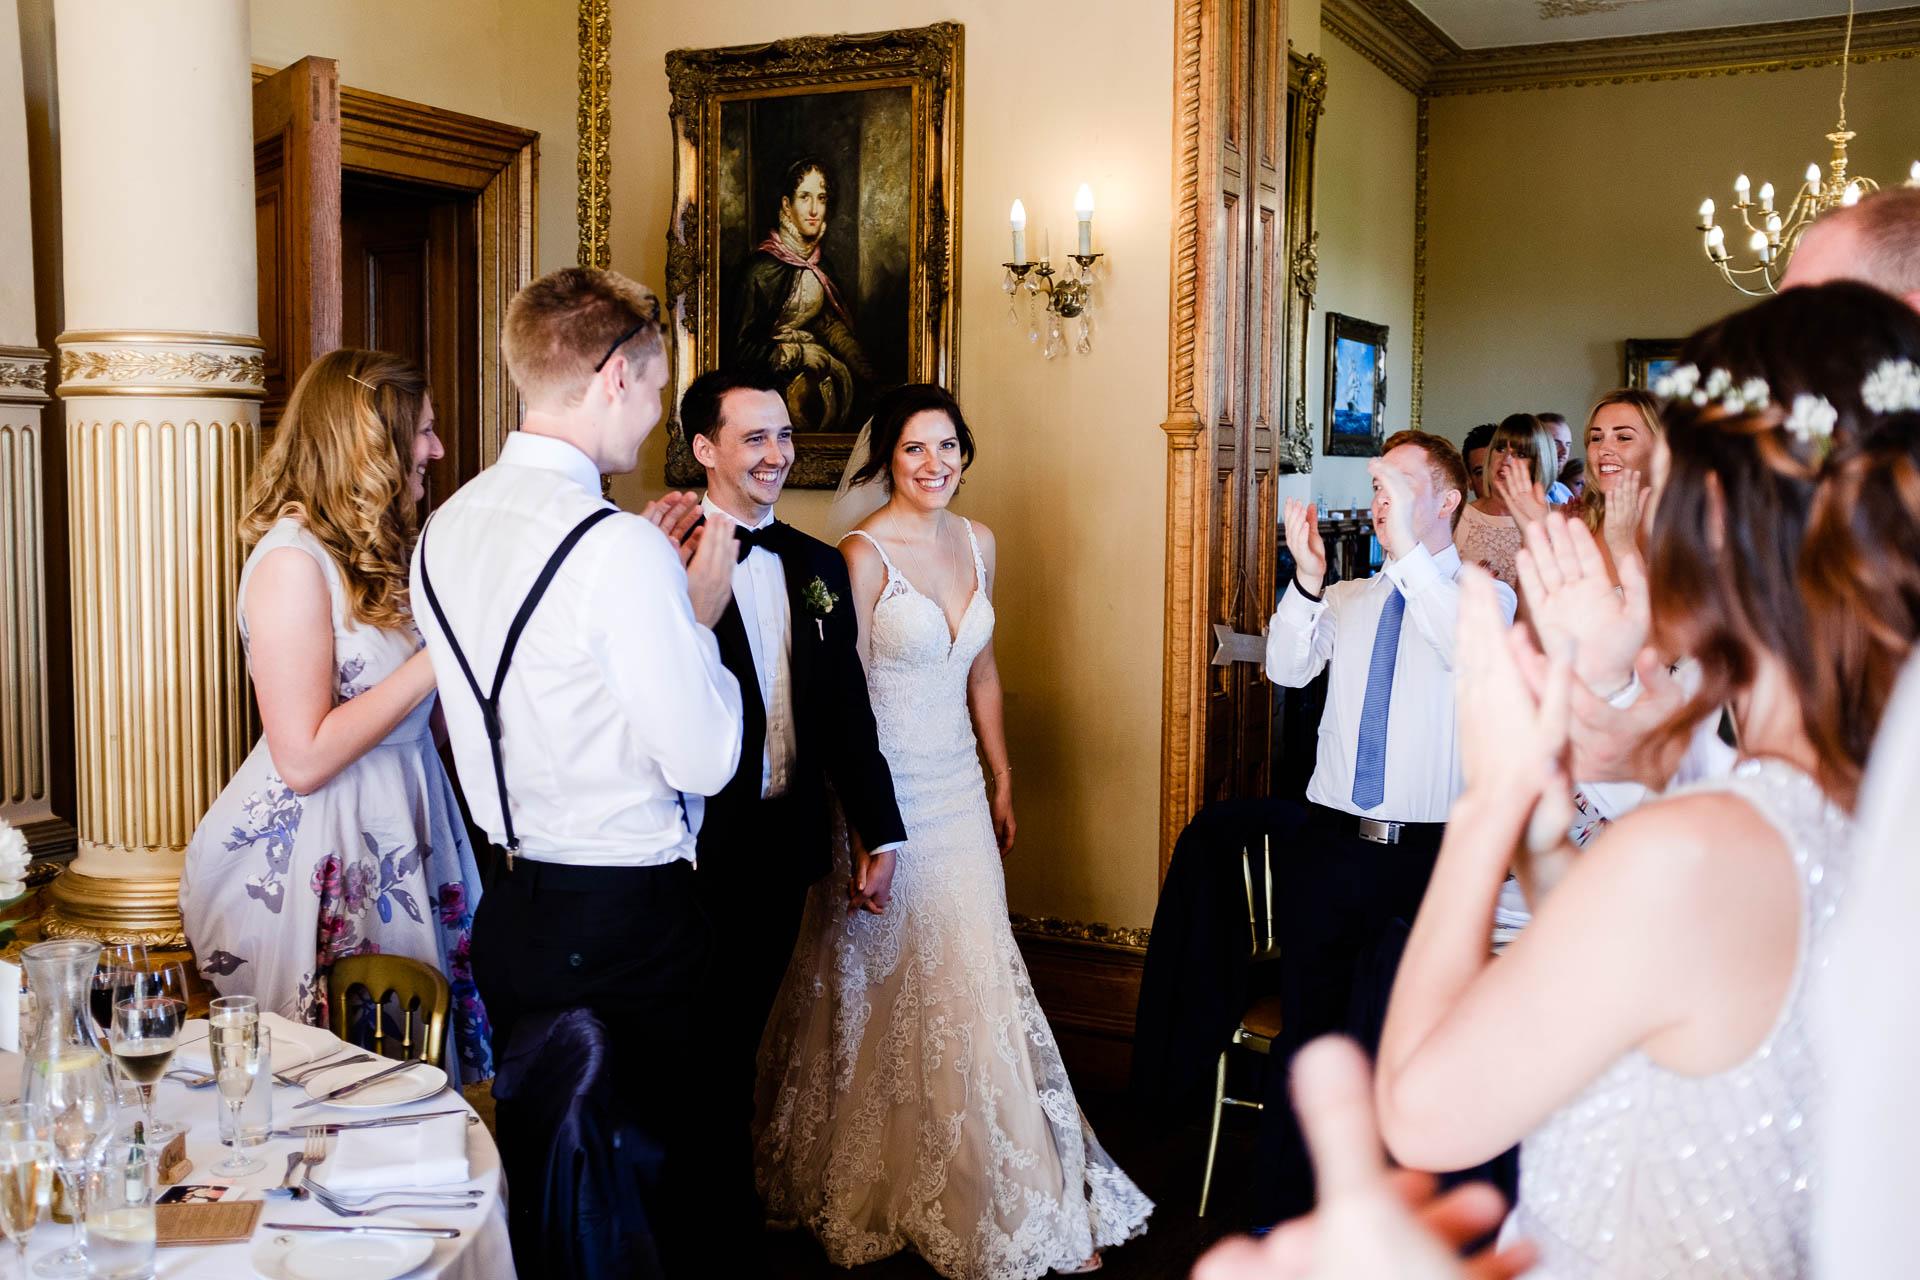 orchardleigh house wedding - Danni & Barney (321).jpg